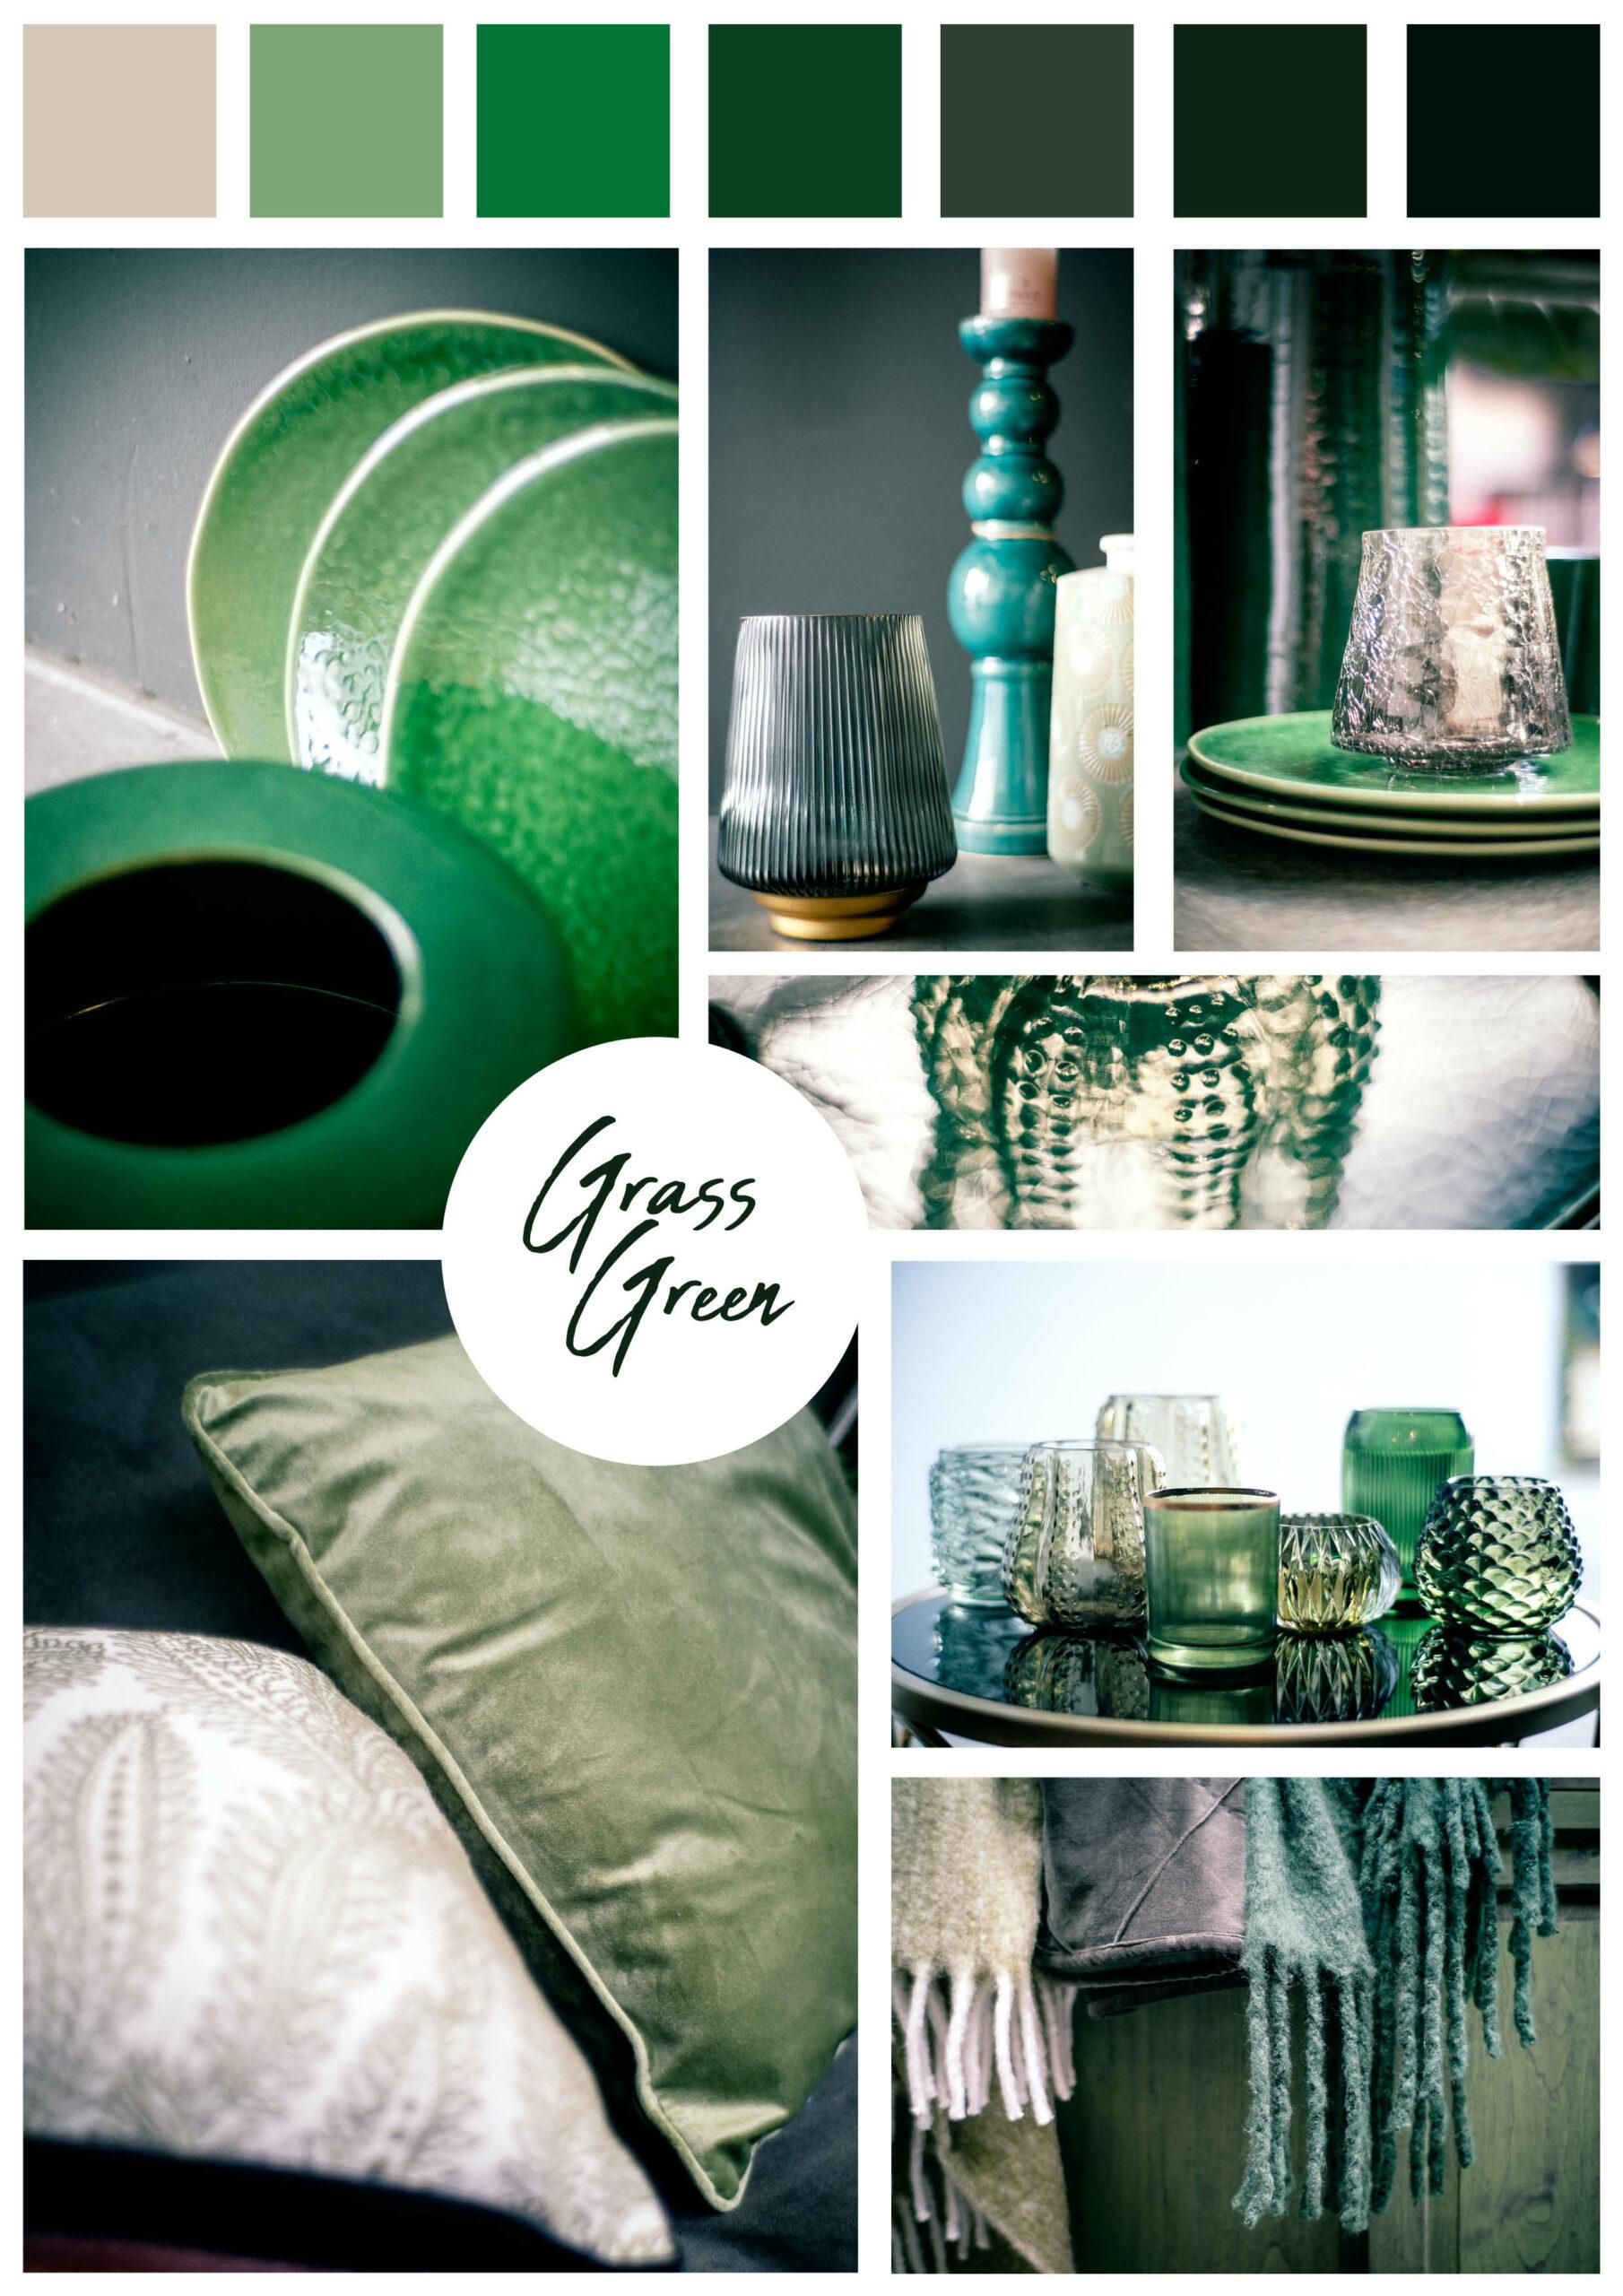 Moodboard_grass green